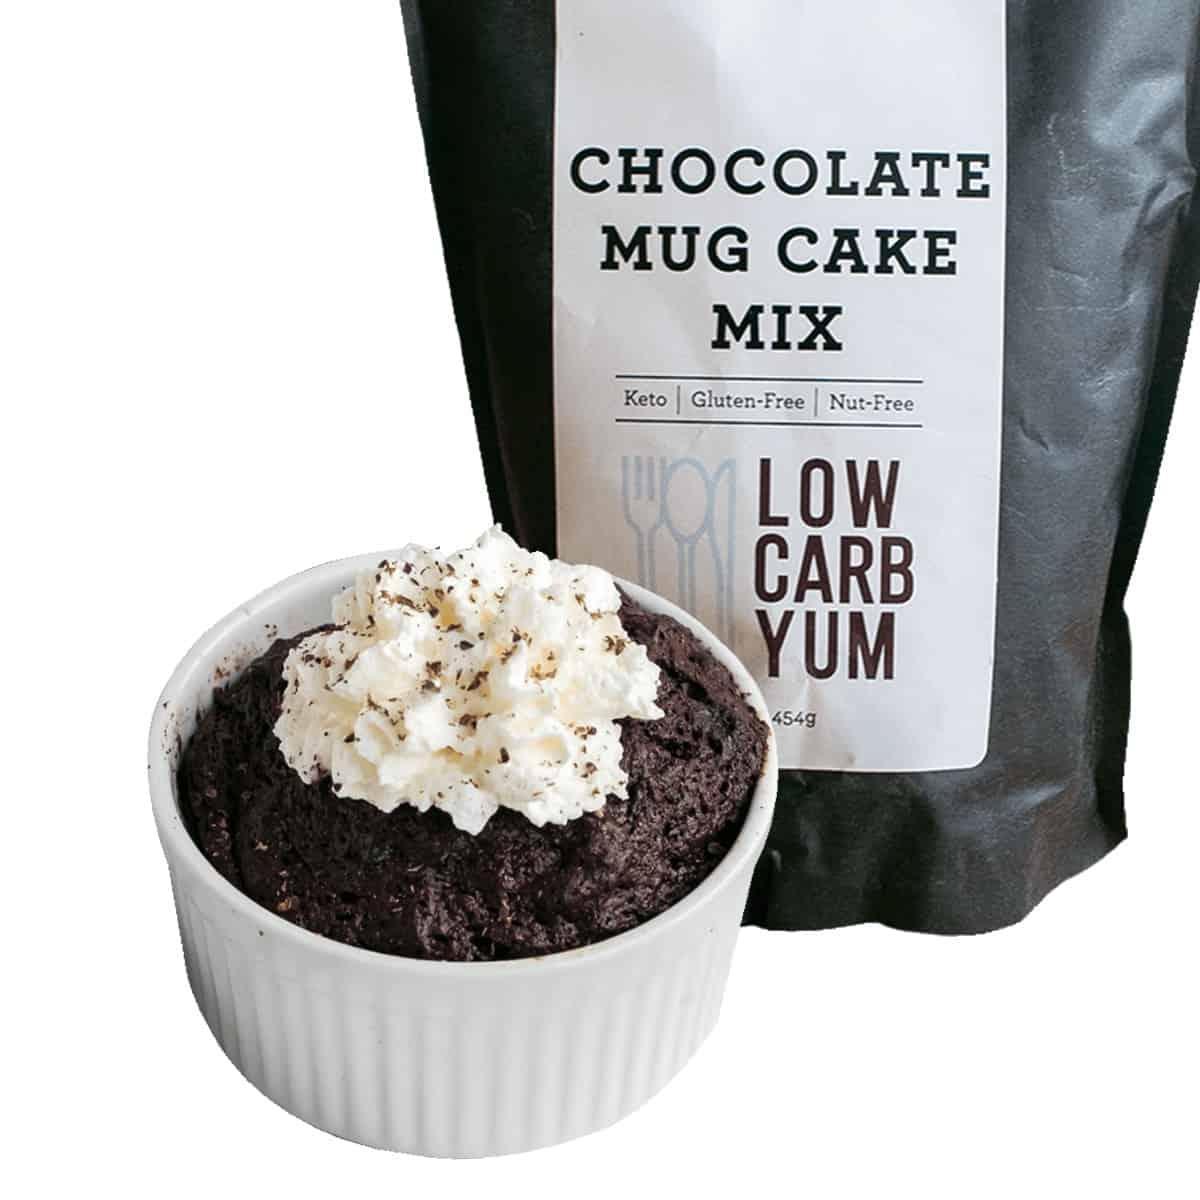 keto chocolate mug cake mix